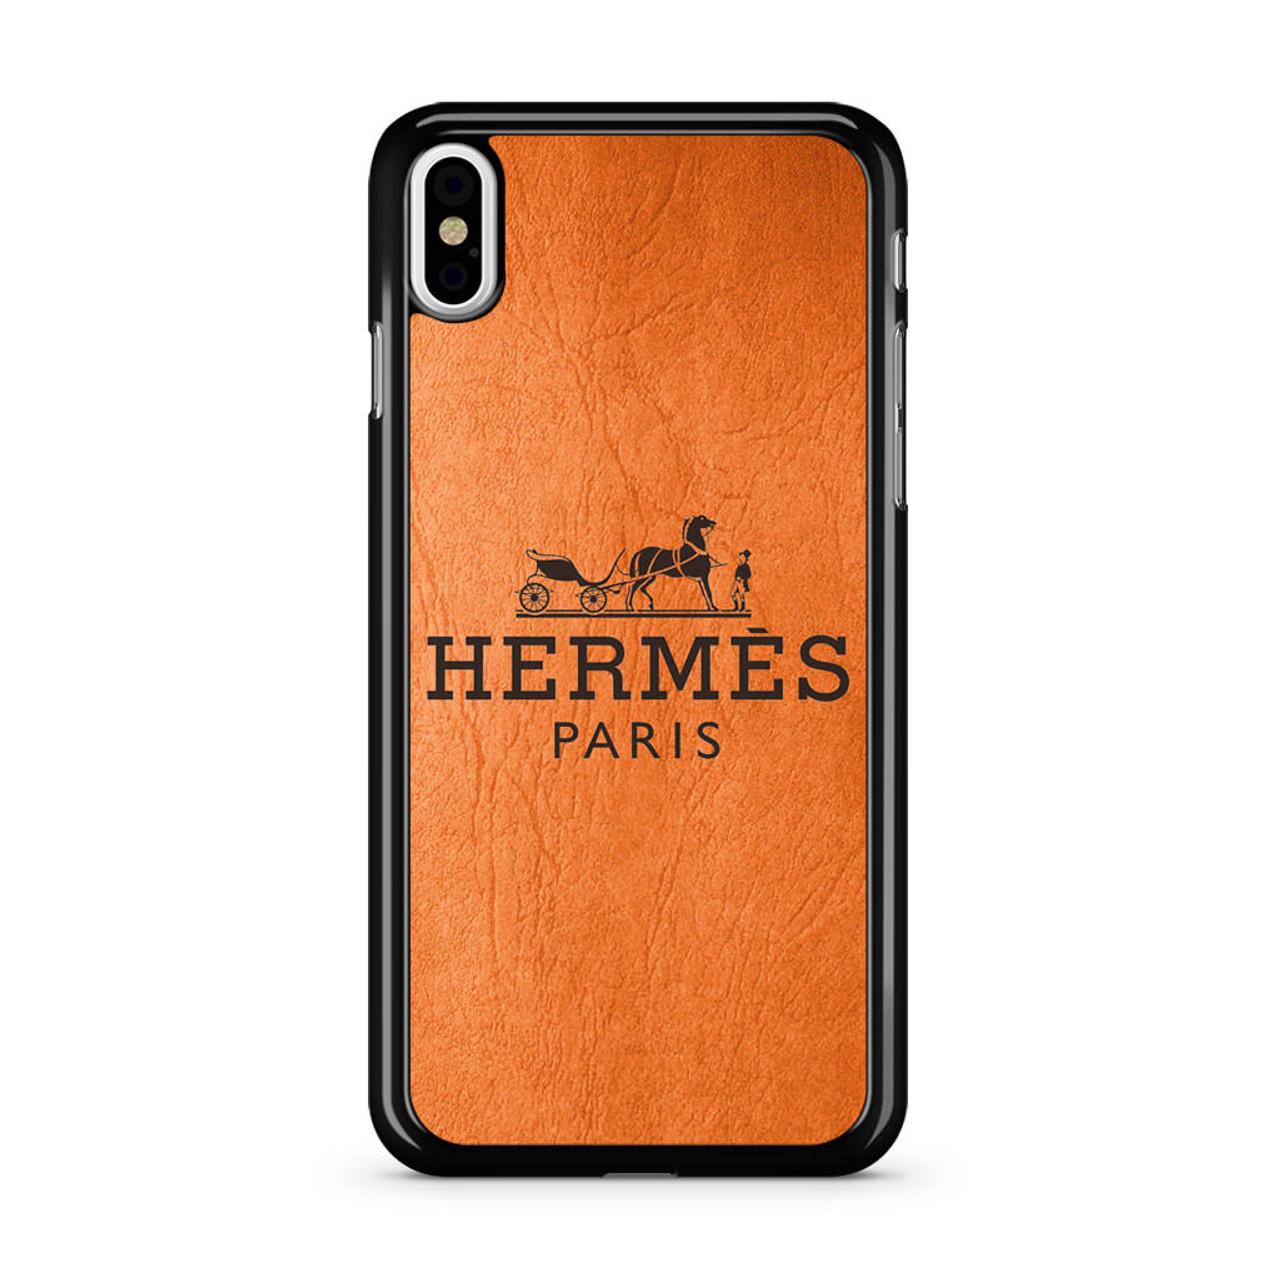 release date 58bf9 79503 Hermes Paris iPhone X Case